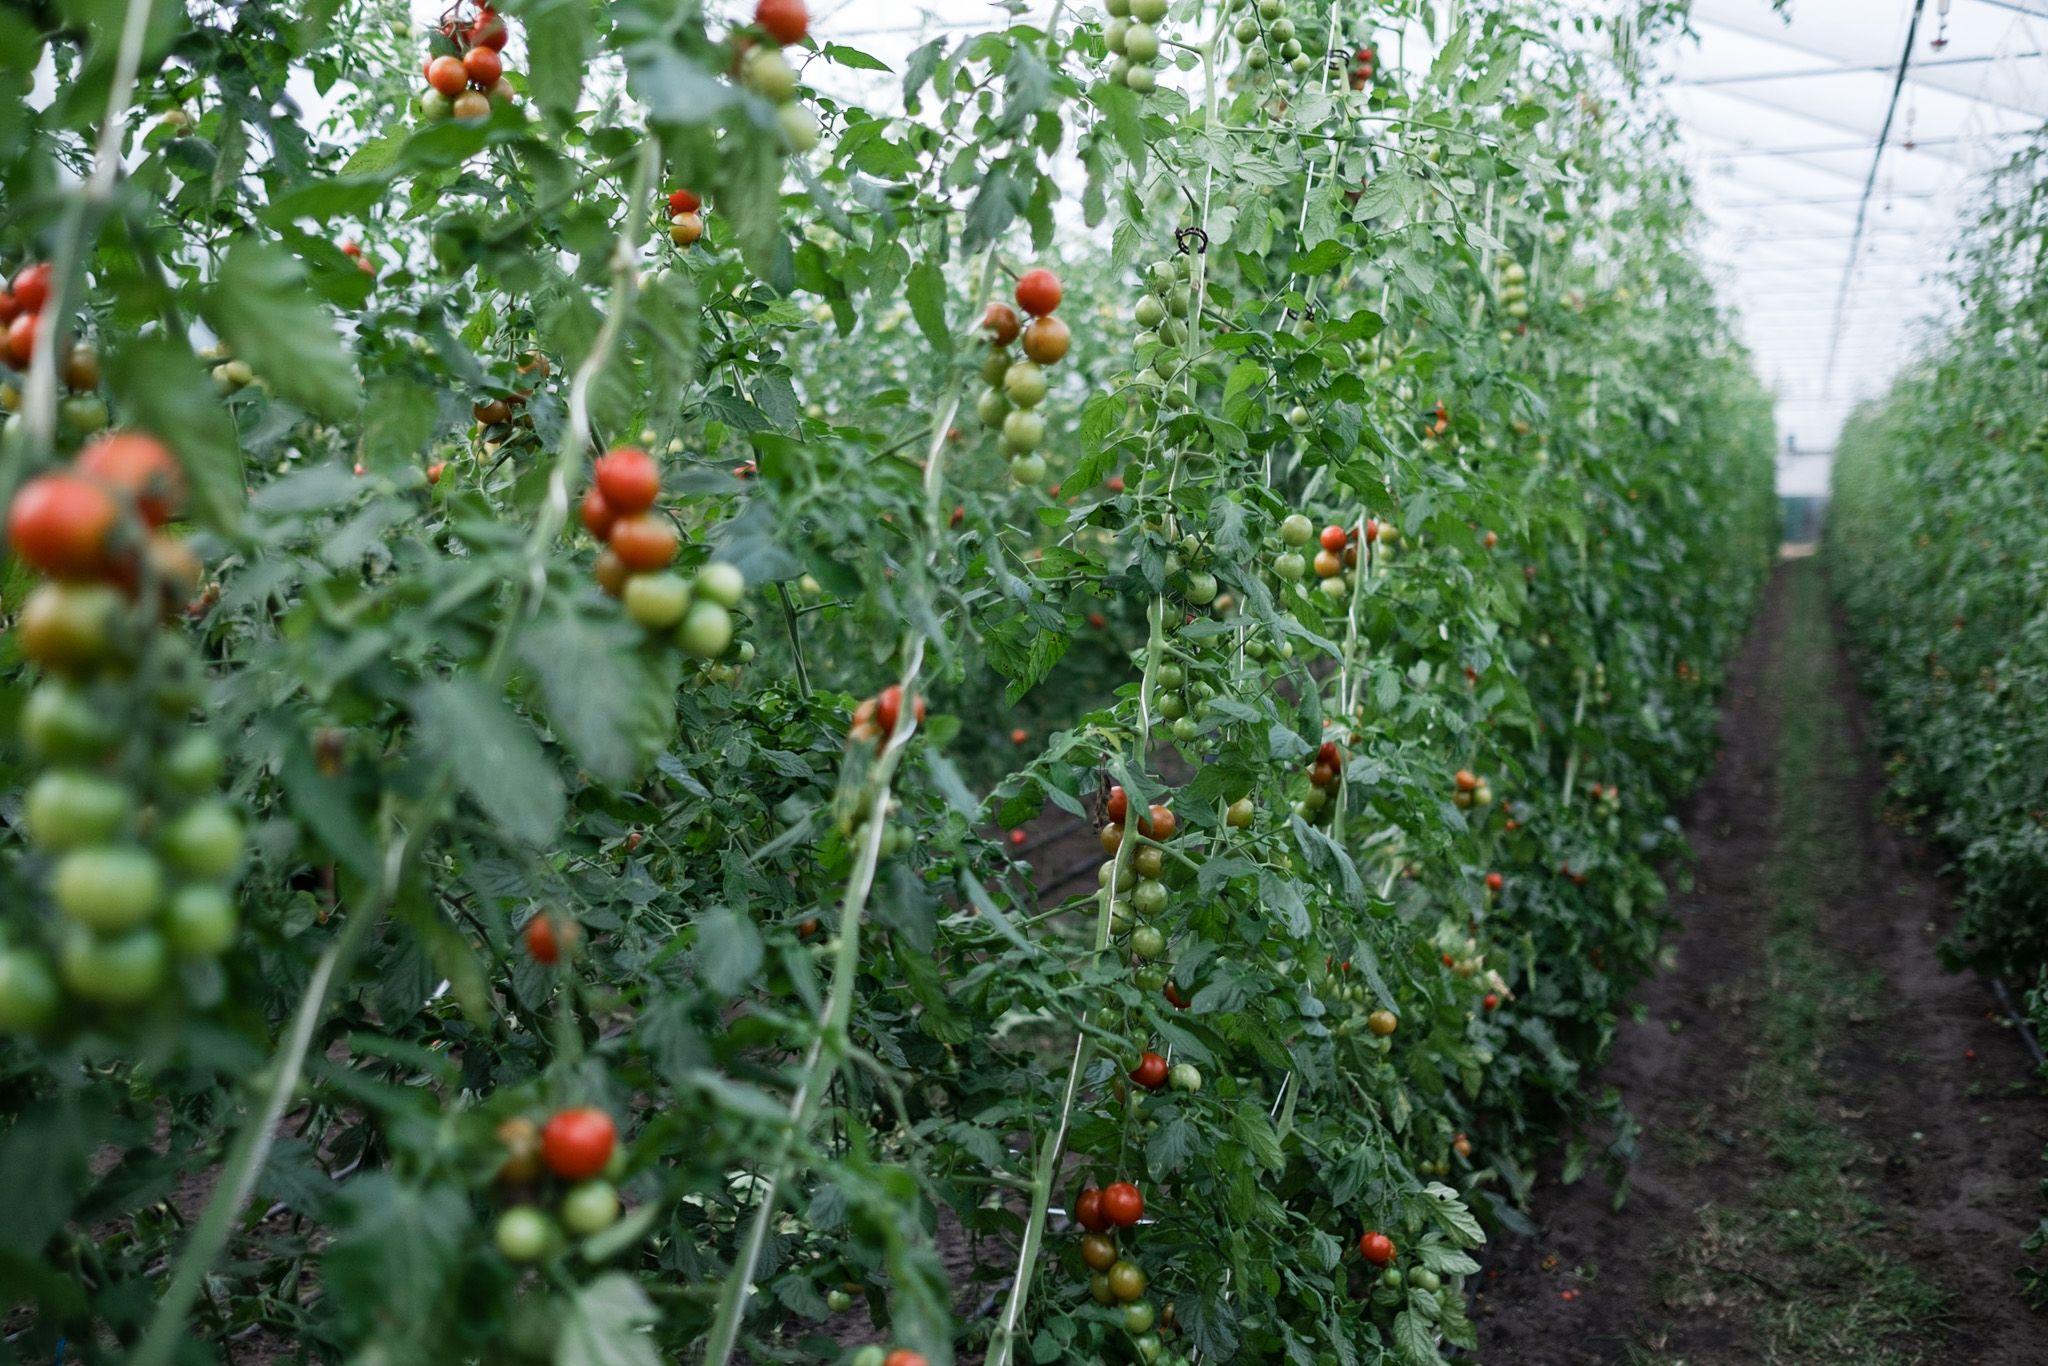 Tomaten Vermehren Pflegen Ernten Teil 1 Saatgutgewinnung Osmers Garten Garten Gartentipps Garten Gestalten